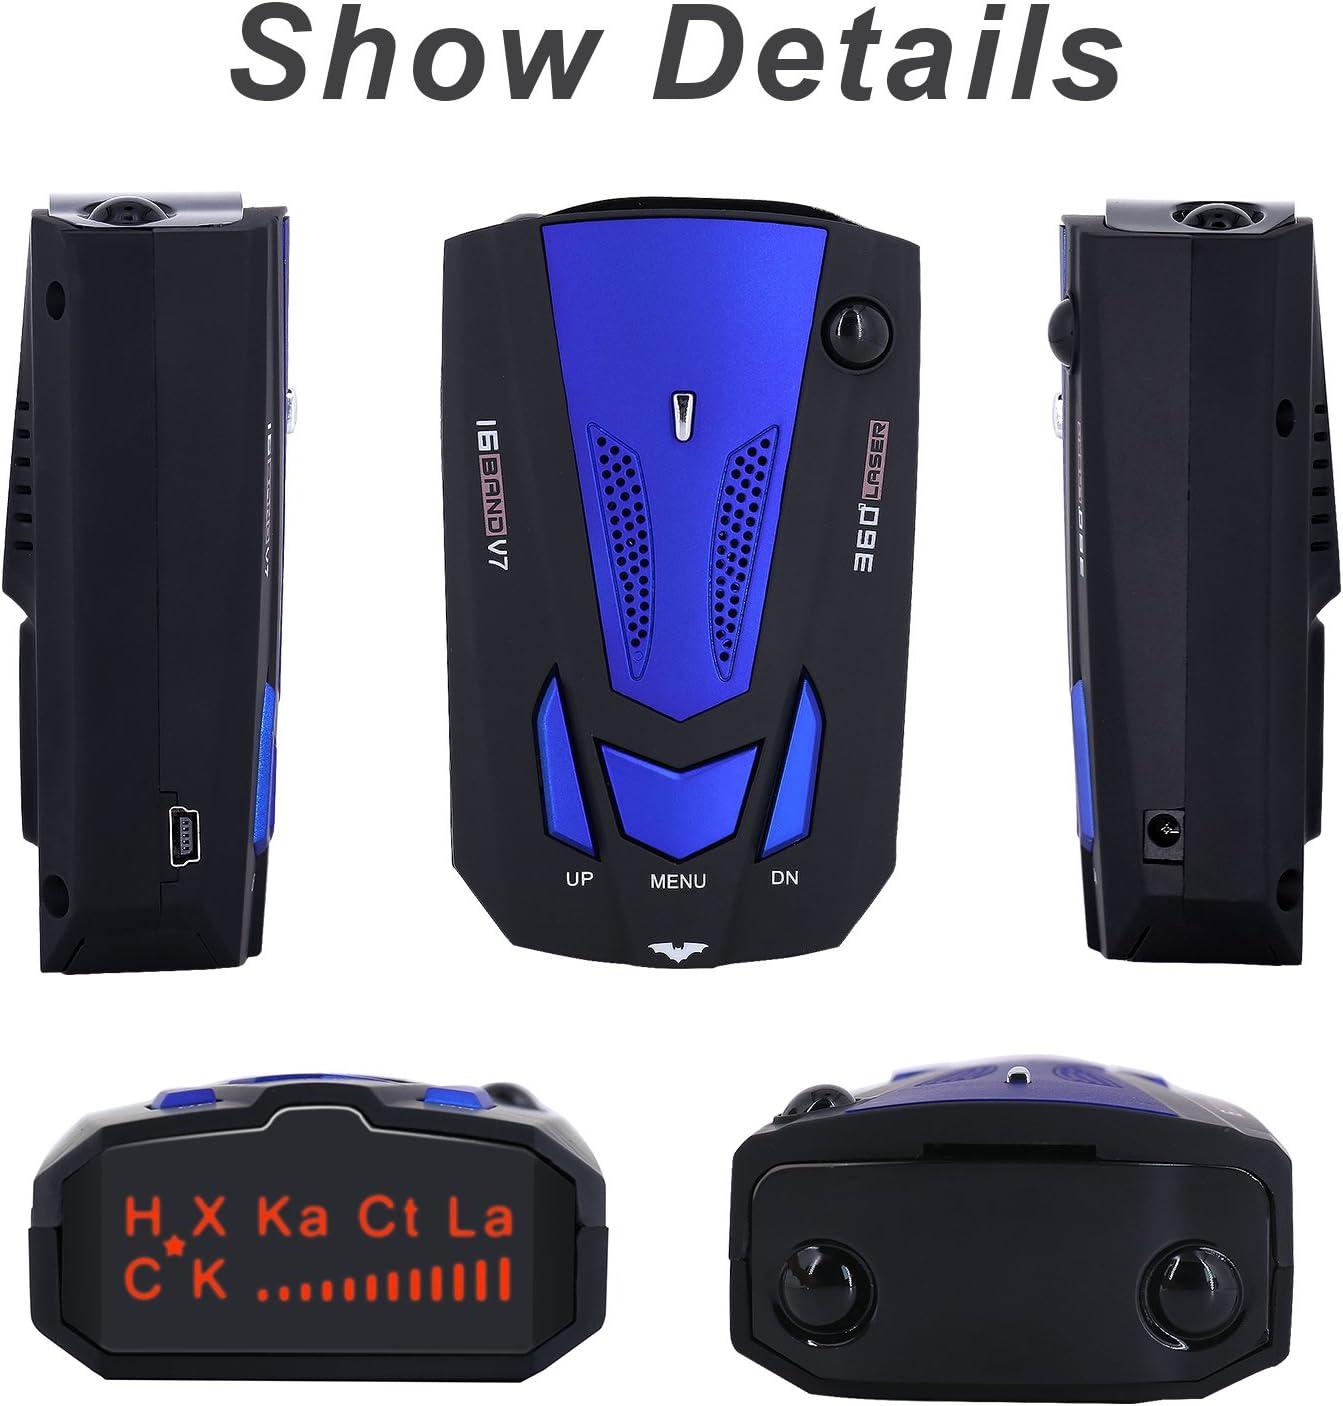 BESWORLDS New Radar Detector Car Speed Laser Radar Detector with Voice Alert and Alarm System Blue Auto Policy Laser Radar Detector Kit for Cars